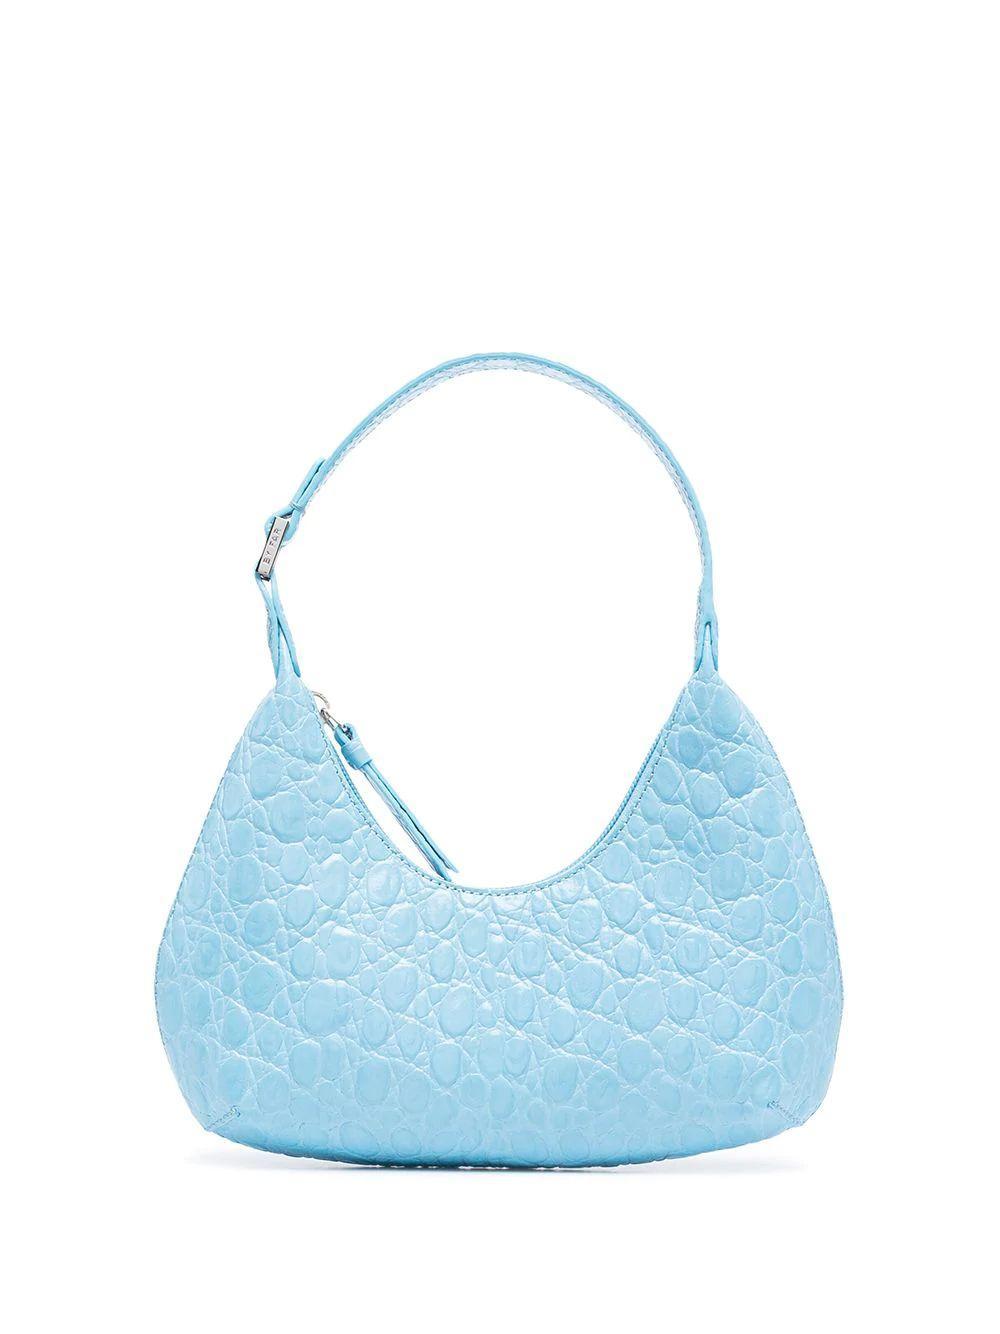 Baby Amber Croco Bag